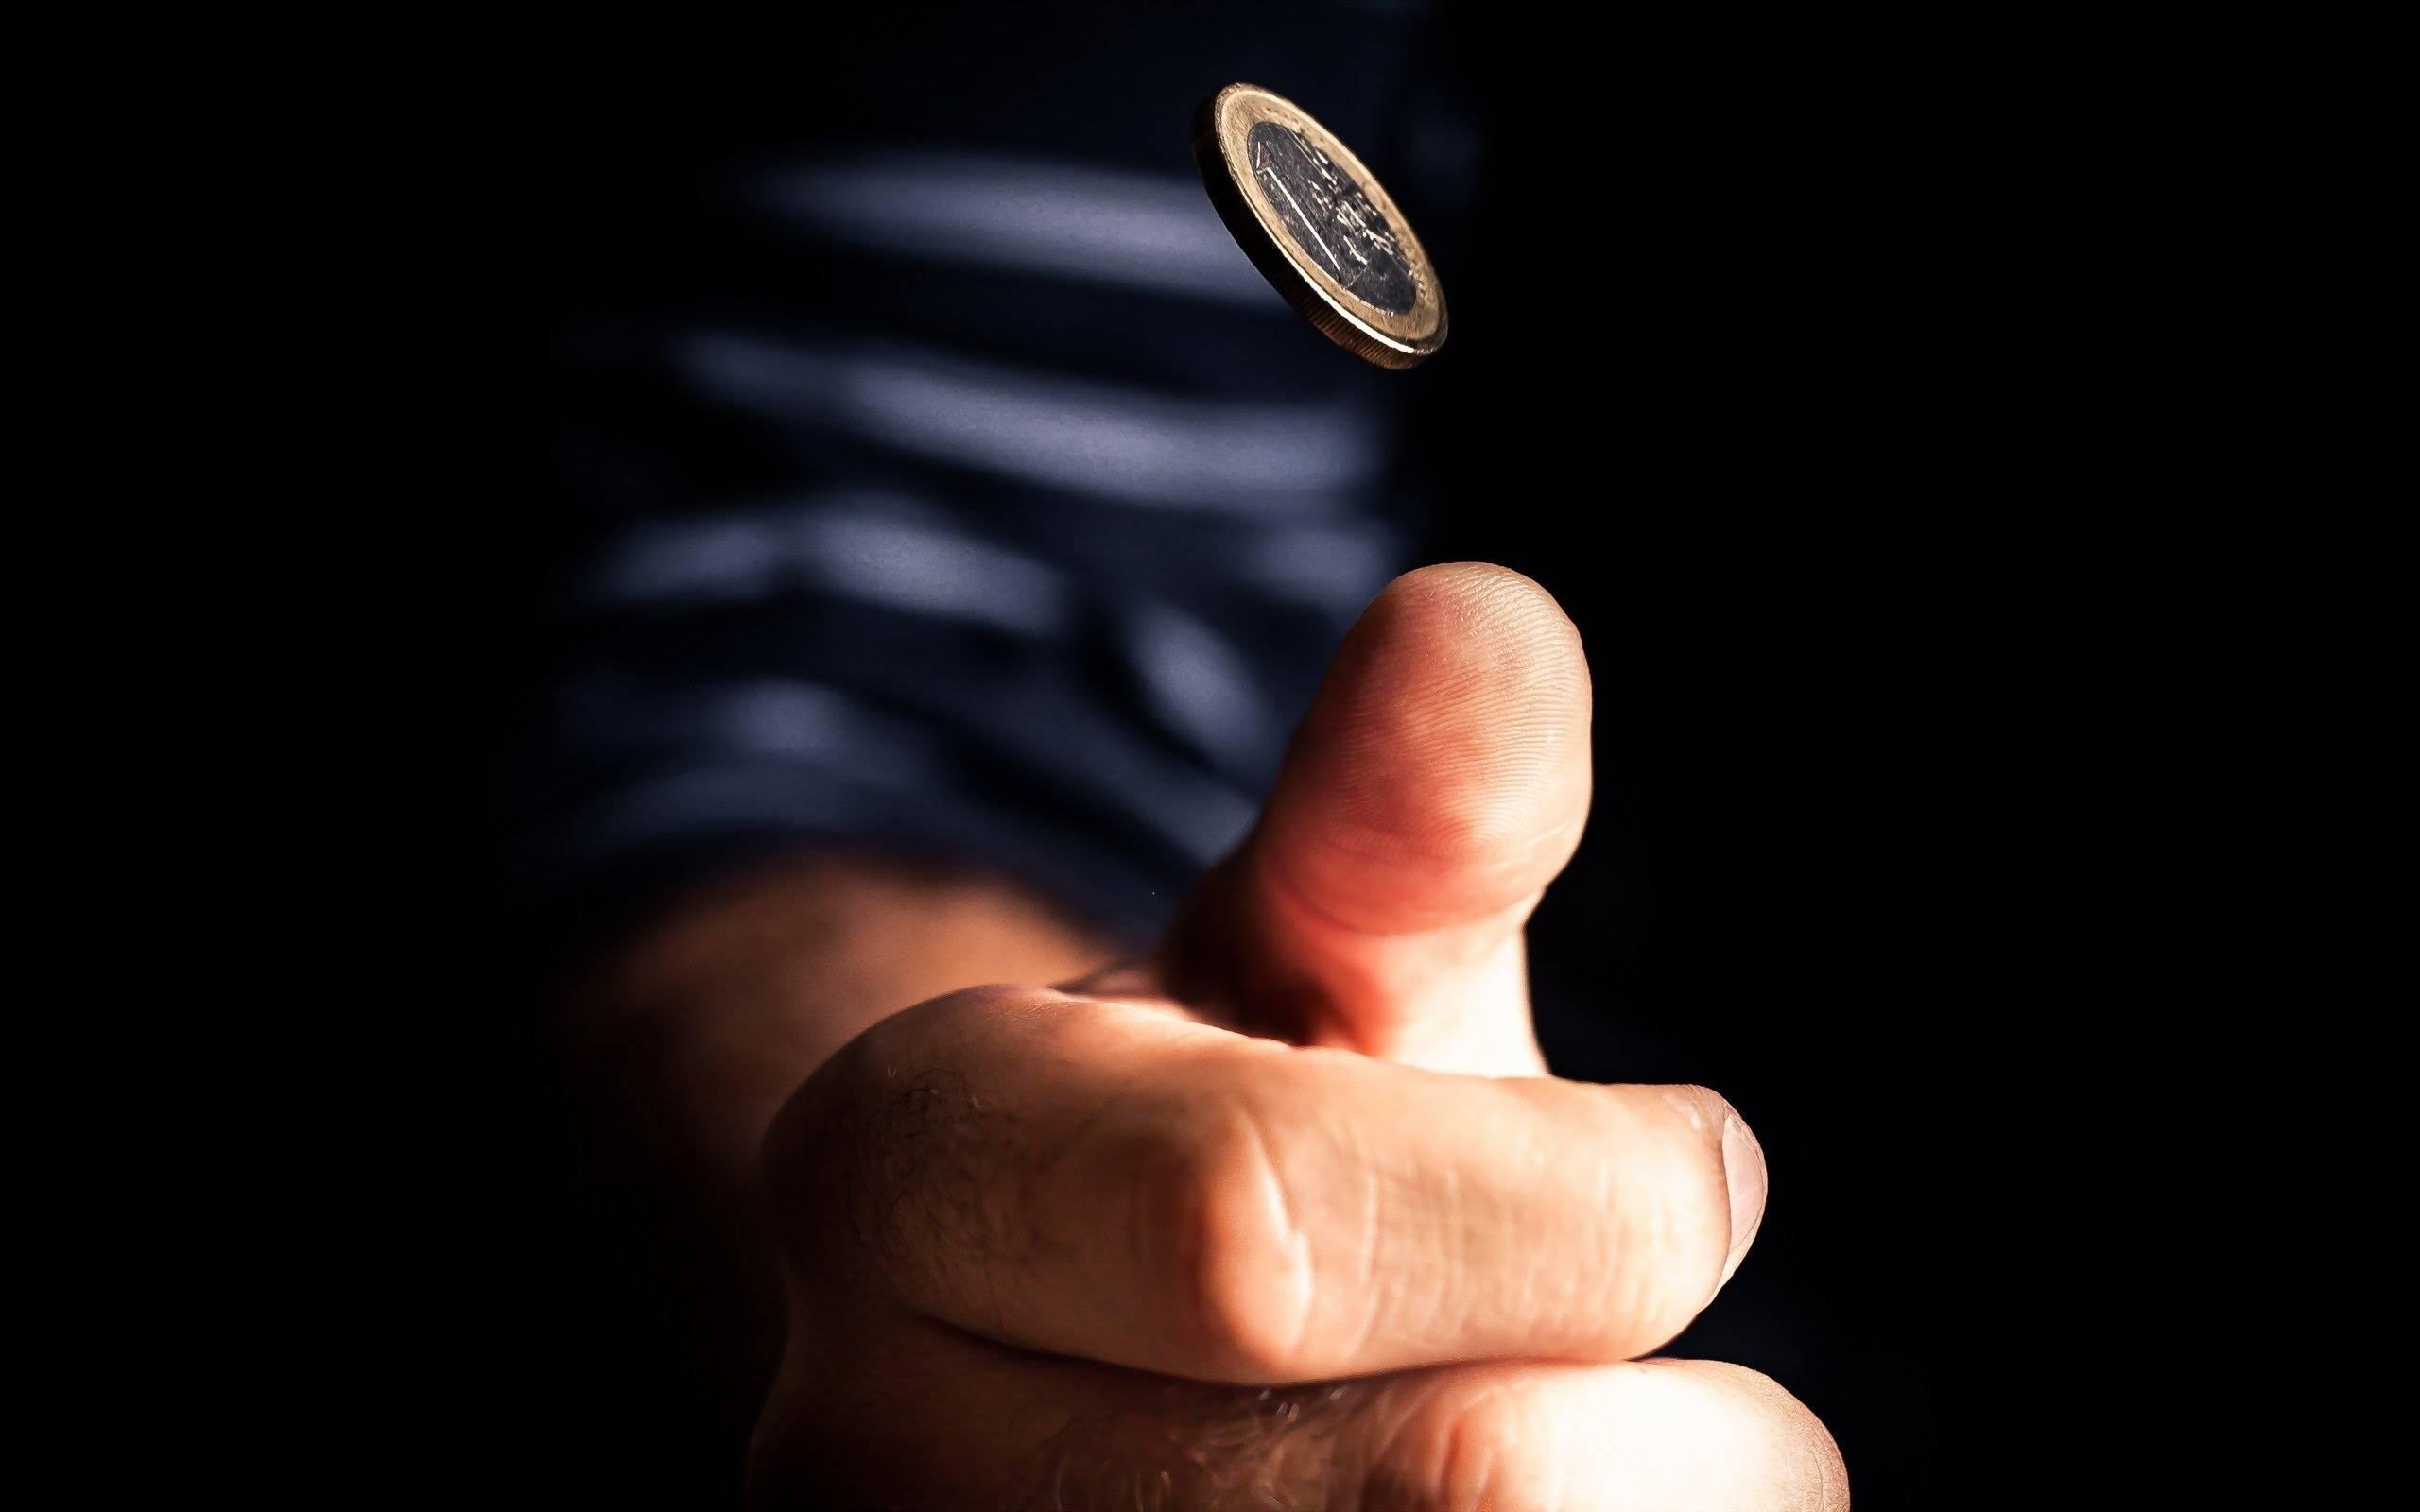 Бросить монетку онлайн, кинуть монетку бесплатно